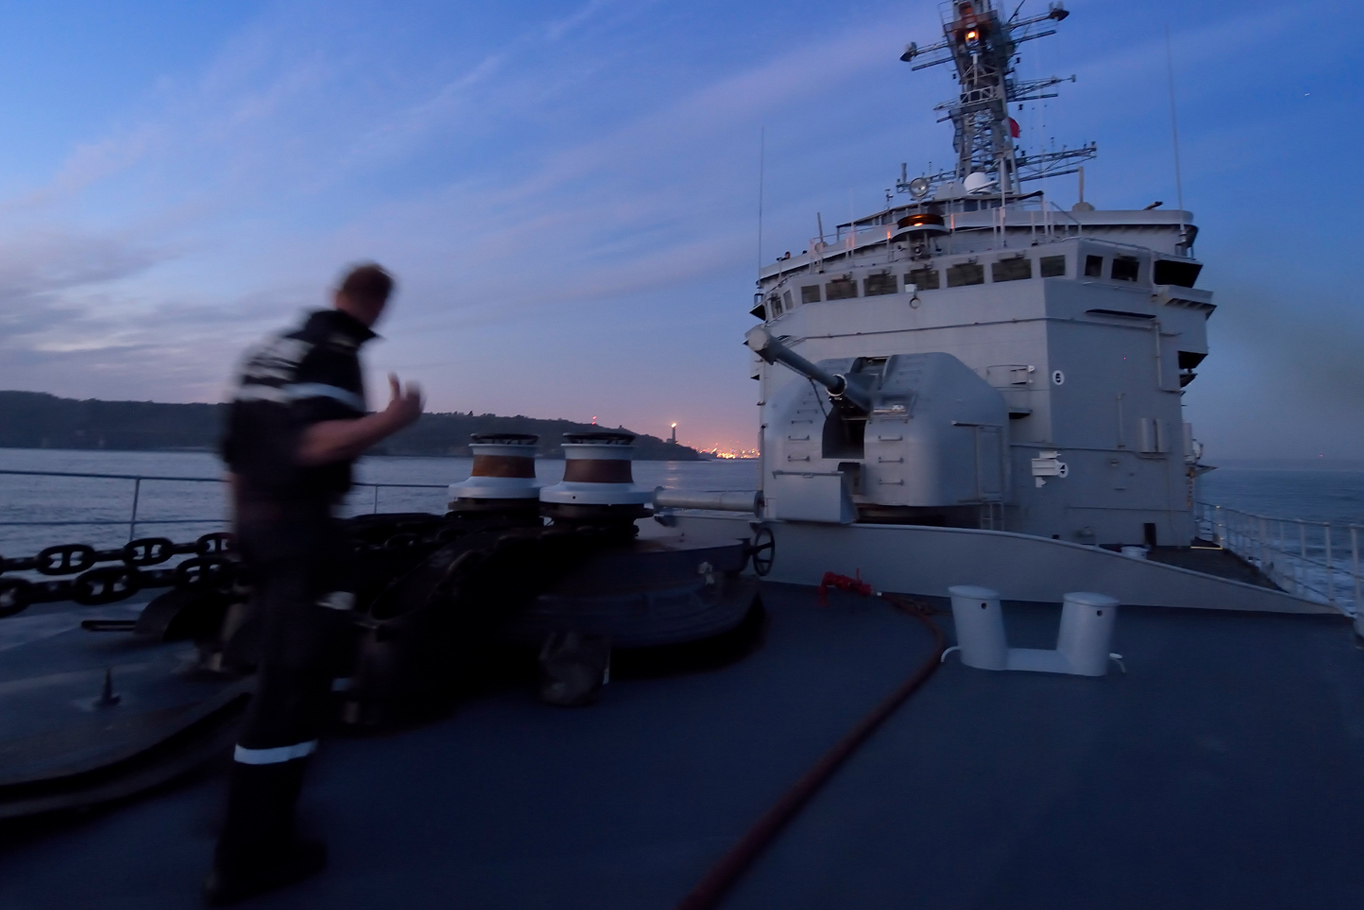 photographie-marine-bretagne-8